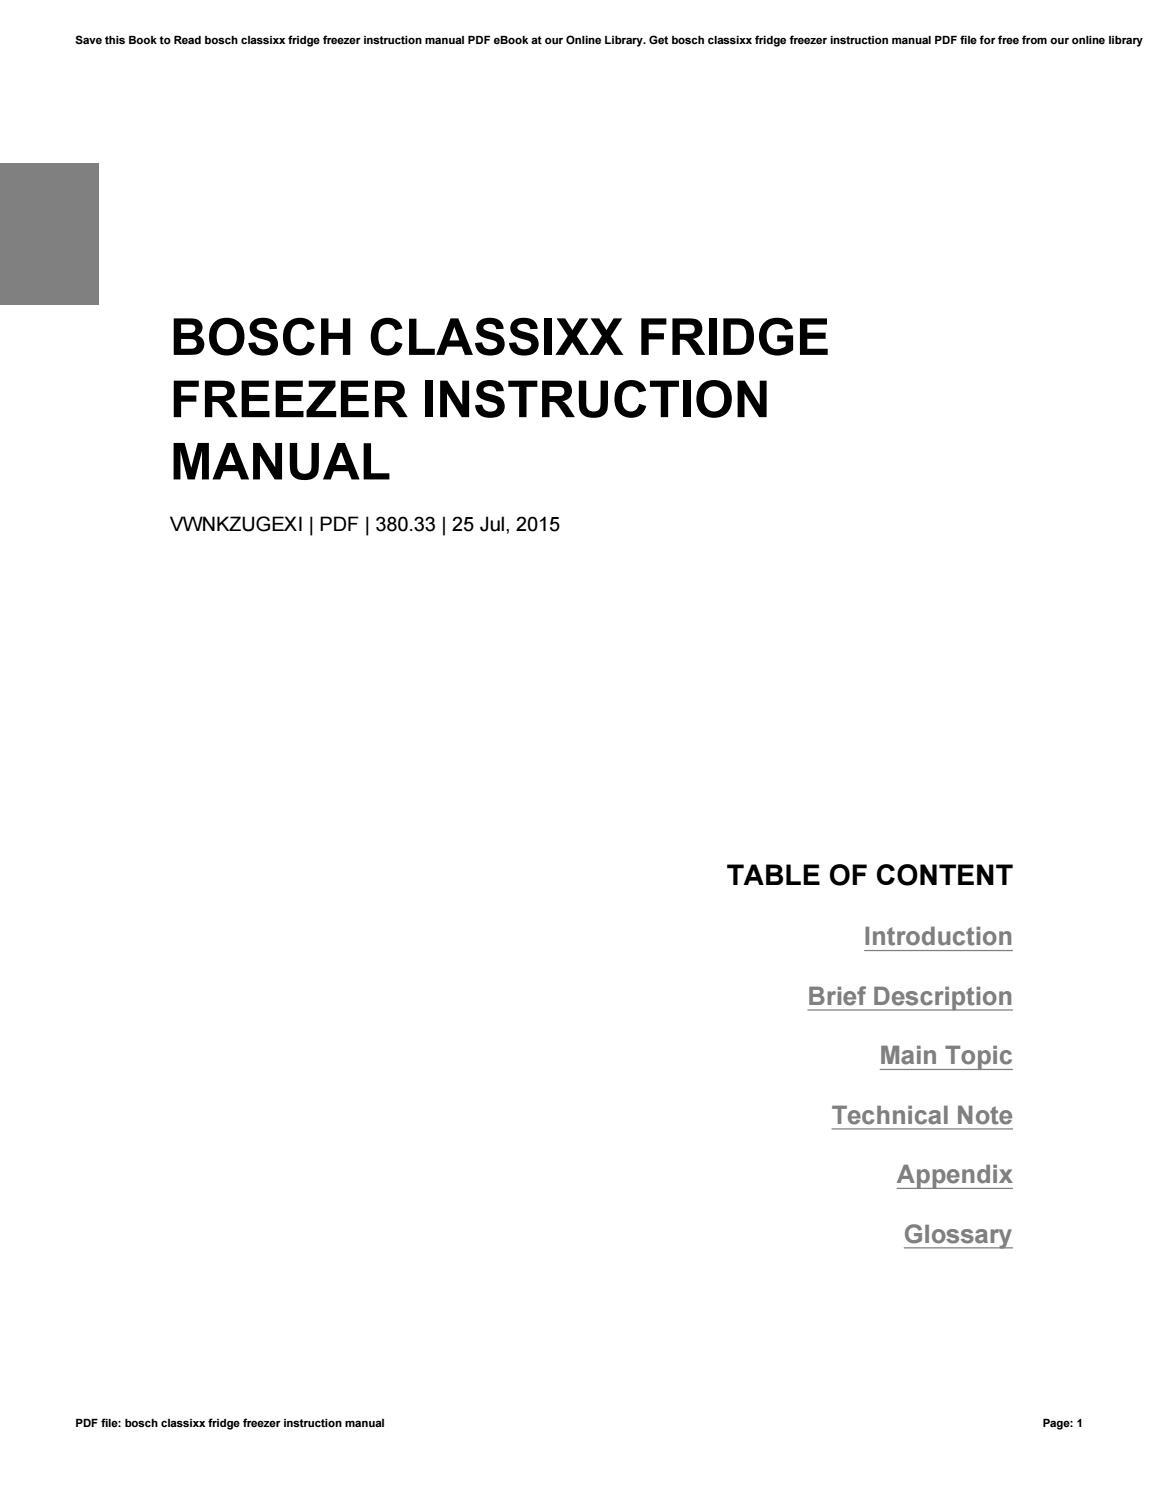 Bosch Classixx Fridge Freezer Instruction Manual By Bonnie Hector Issuu